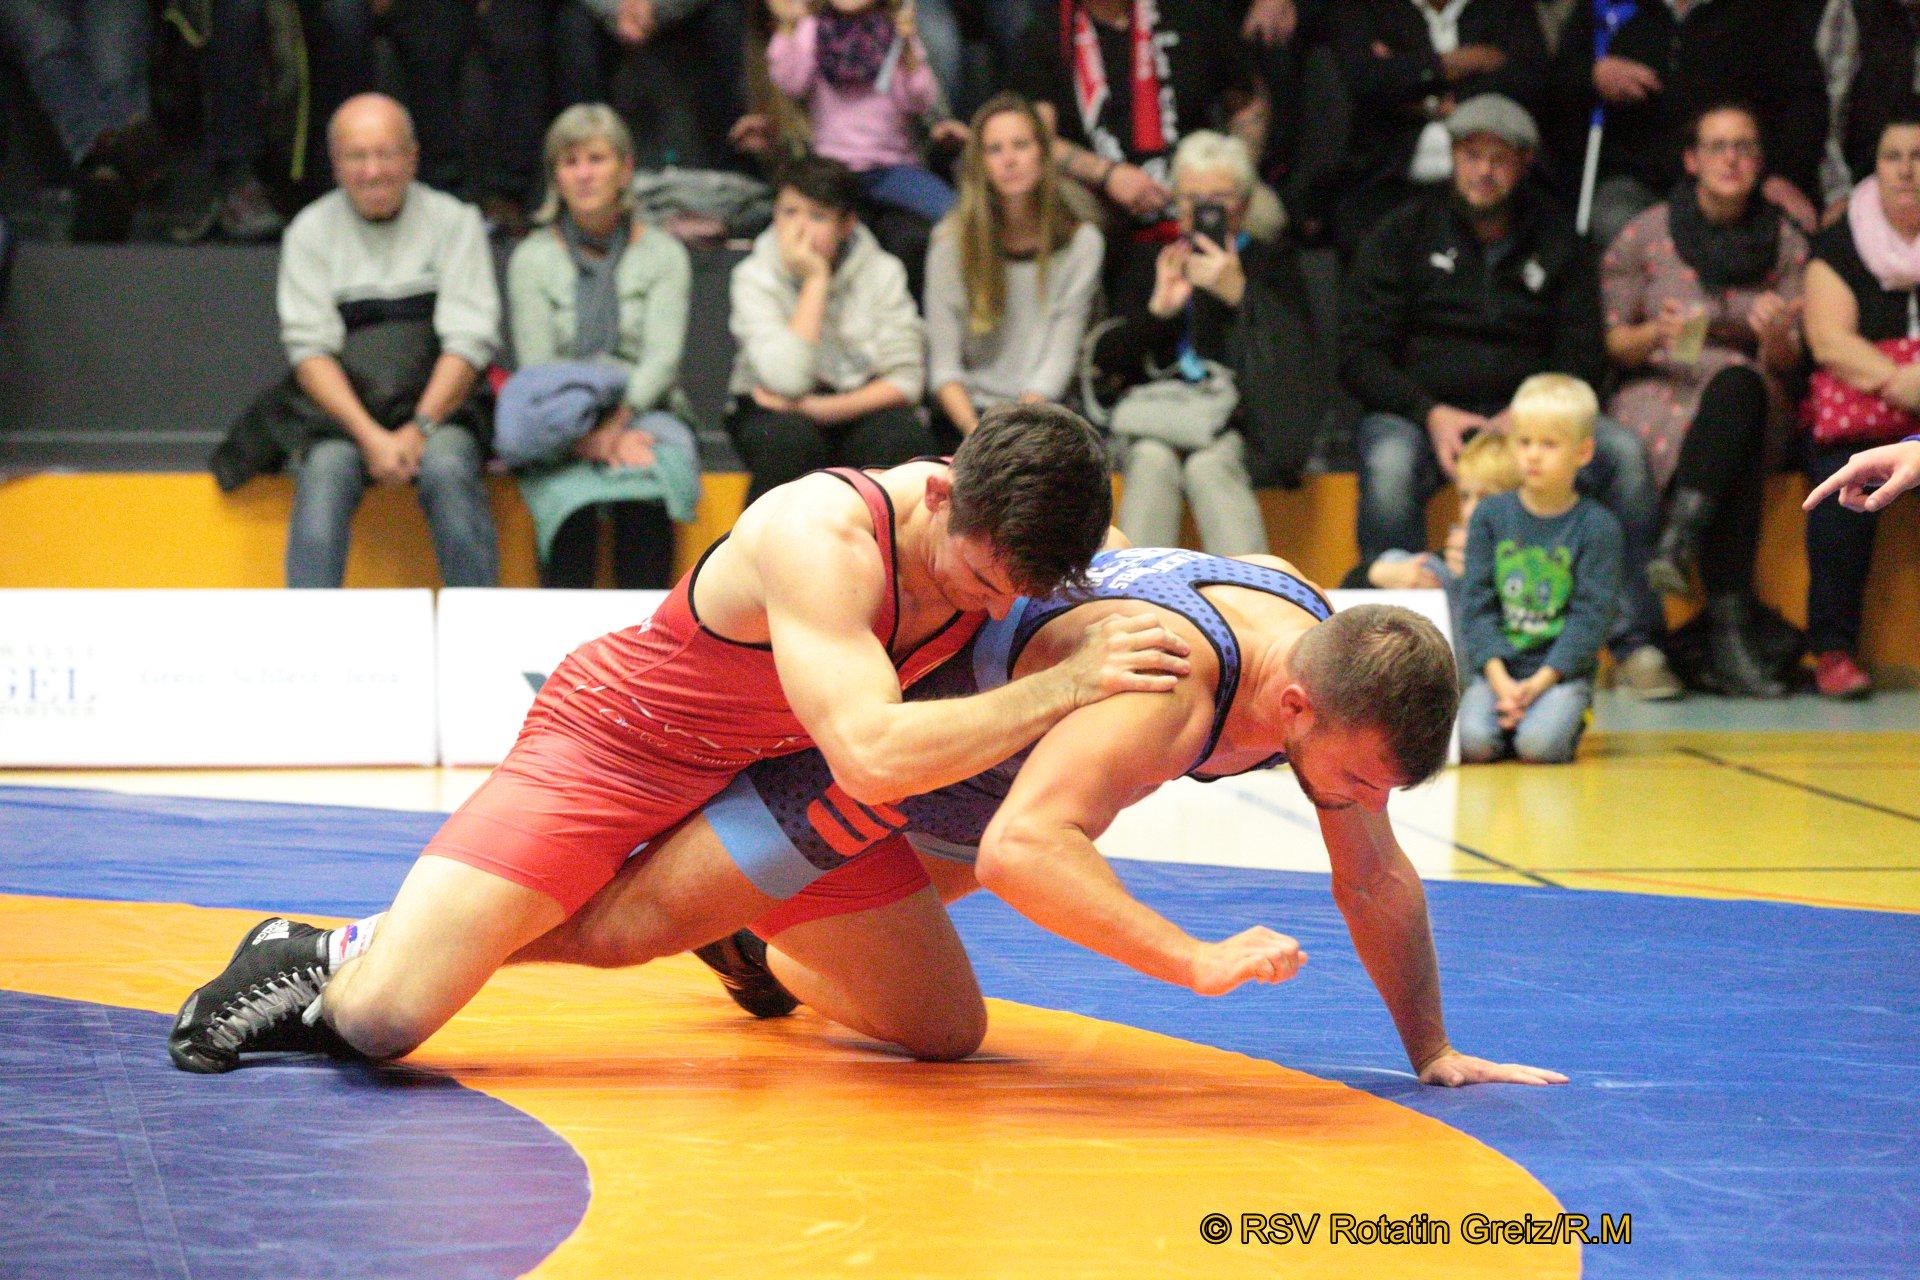 75A kg Freistil: Daniel Sartakov (1) (rotes Trikot), RSV Rotation Greiz gegen Johannes Lurz (-2), AC Lichtenfels 2:0/PS/7:1/06:00